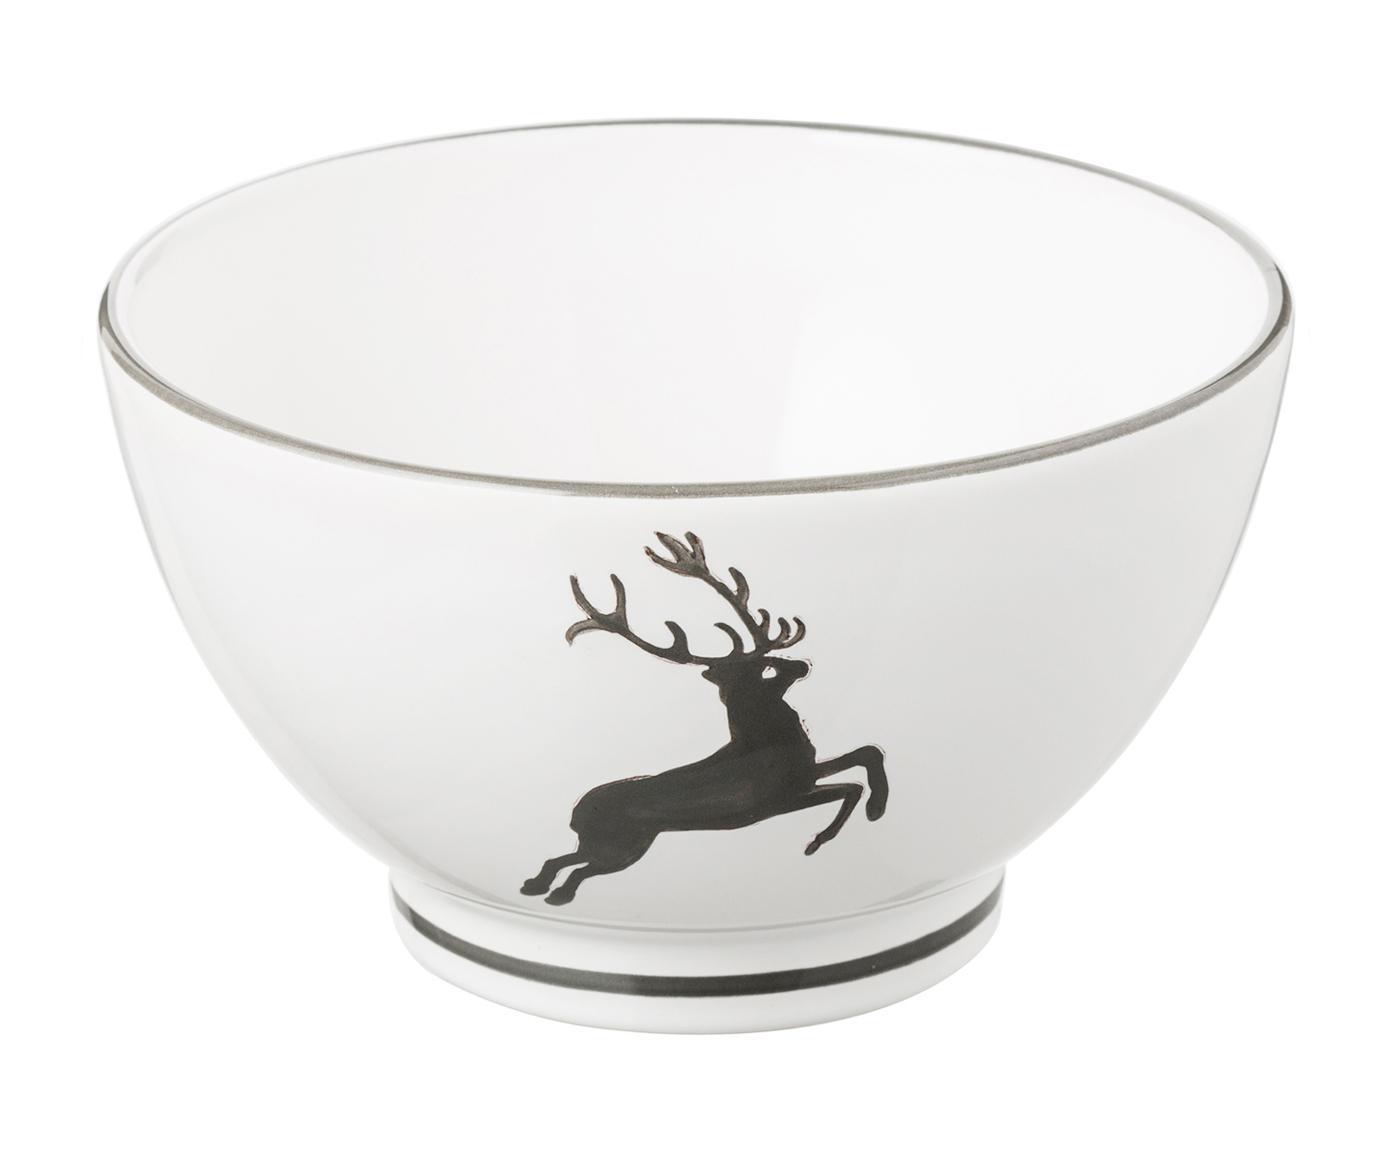 Ciotola Grauer Hirsch, Ceramica, Grigio, bianco, Ø 14 cm